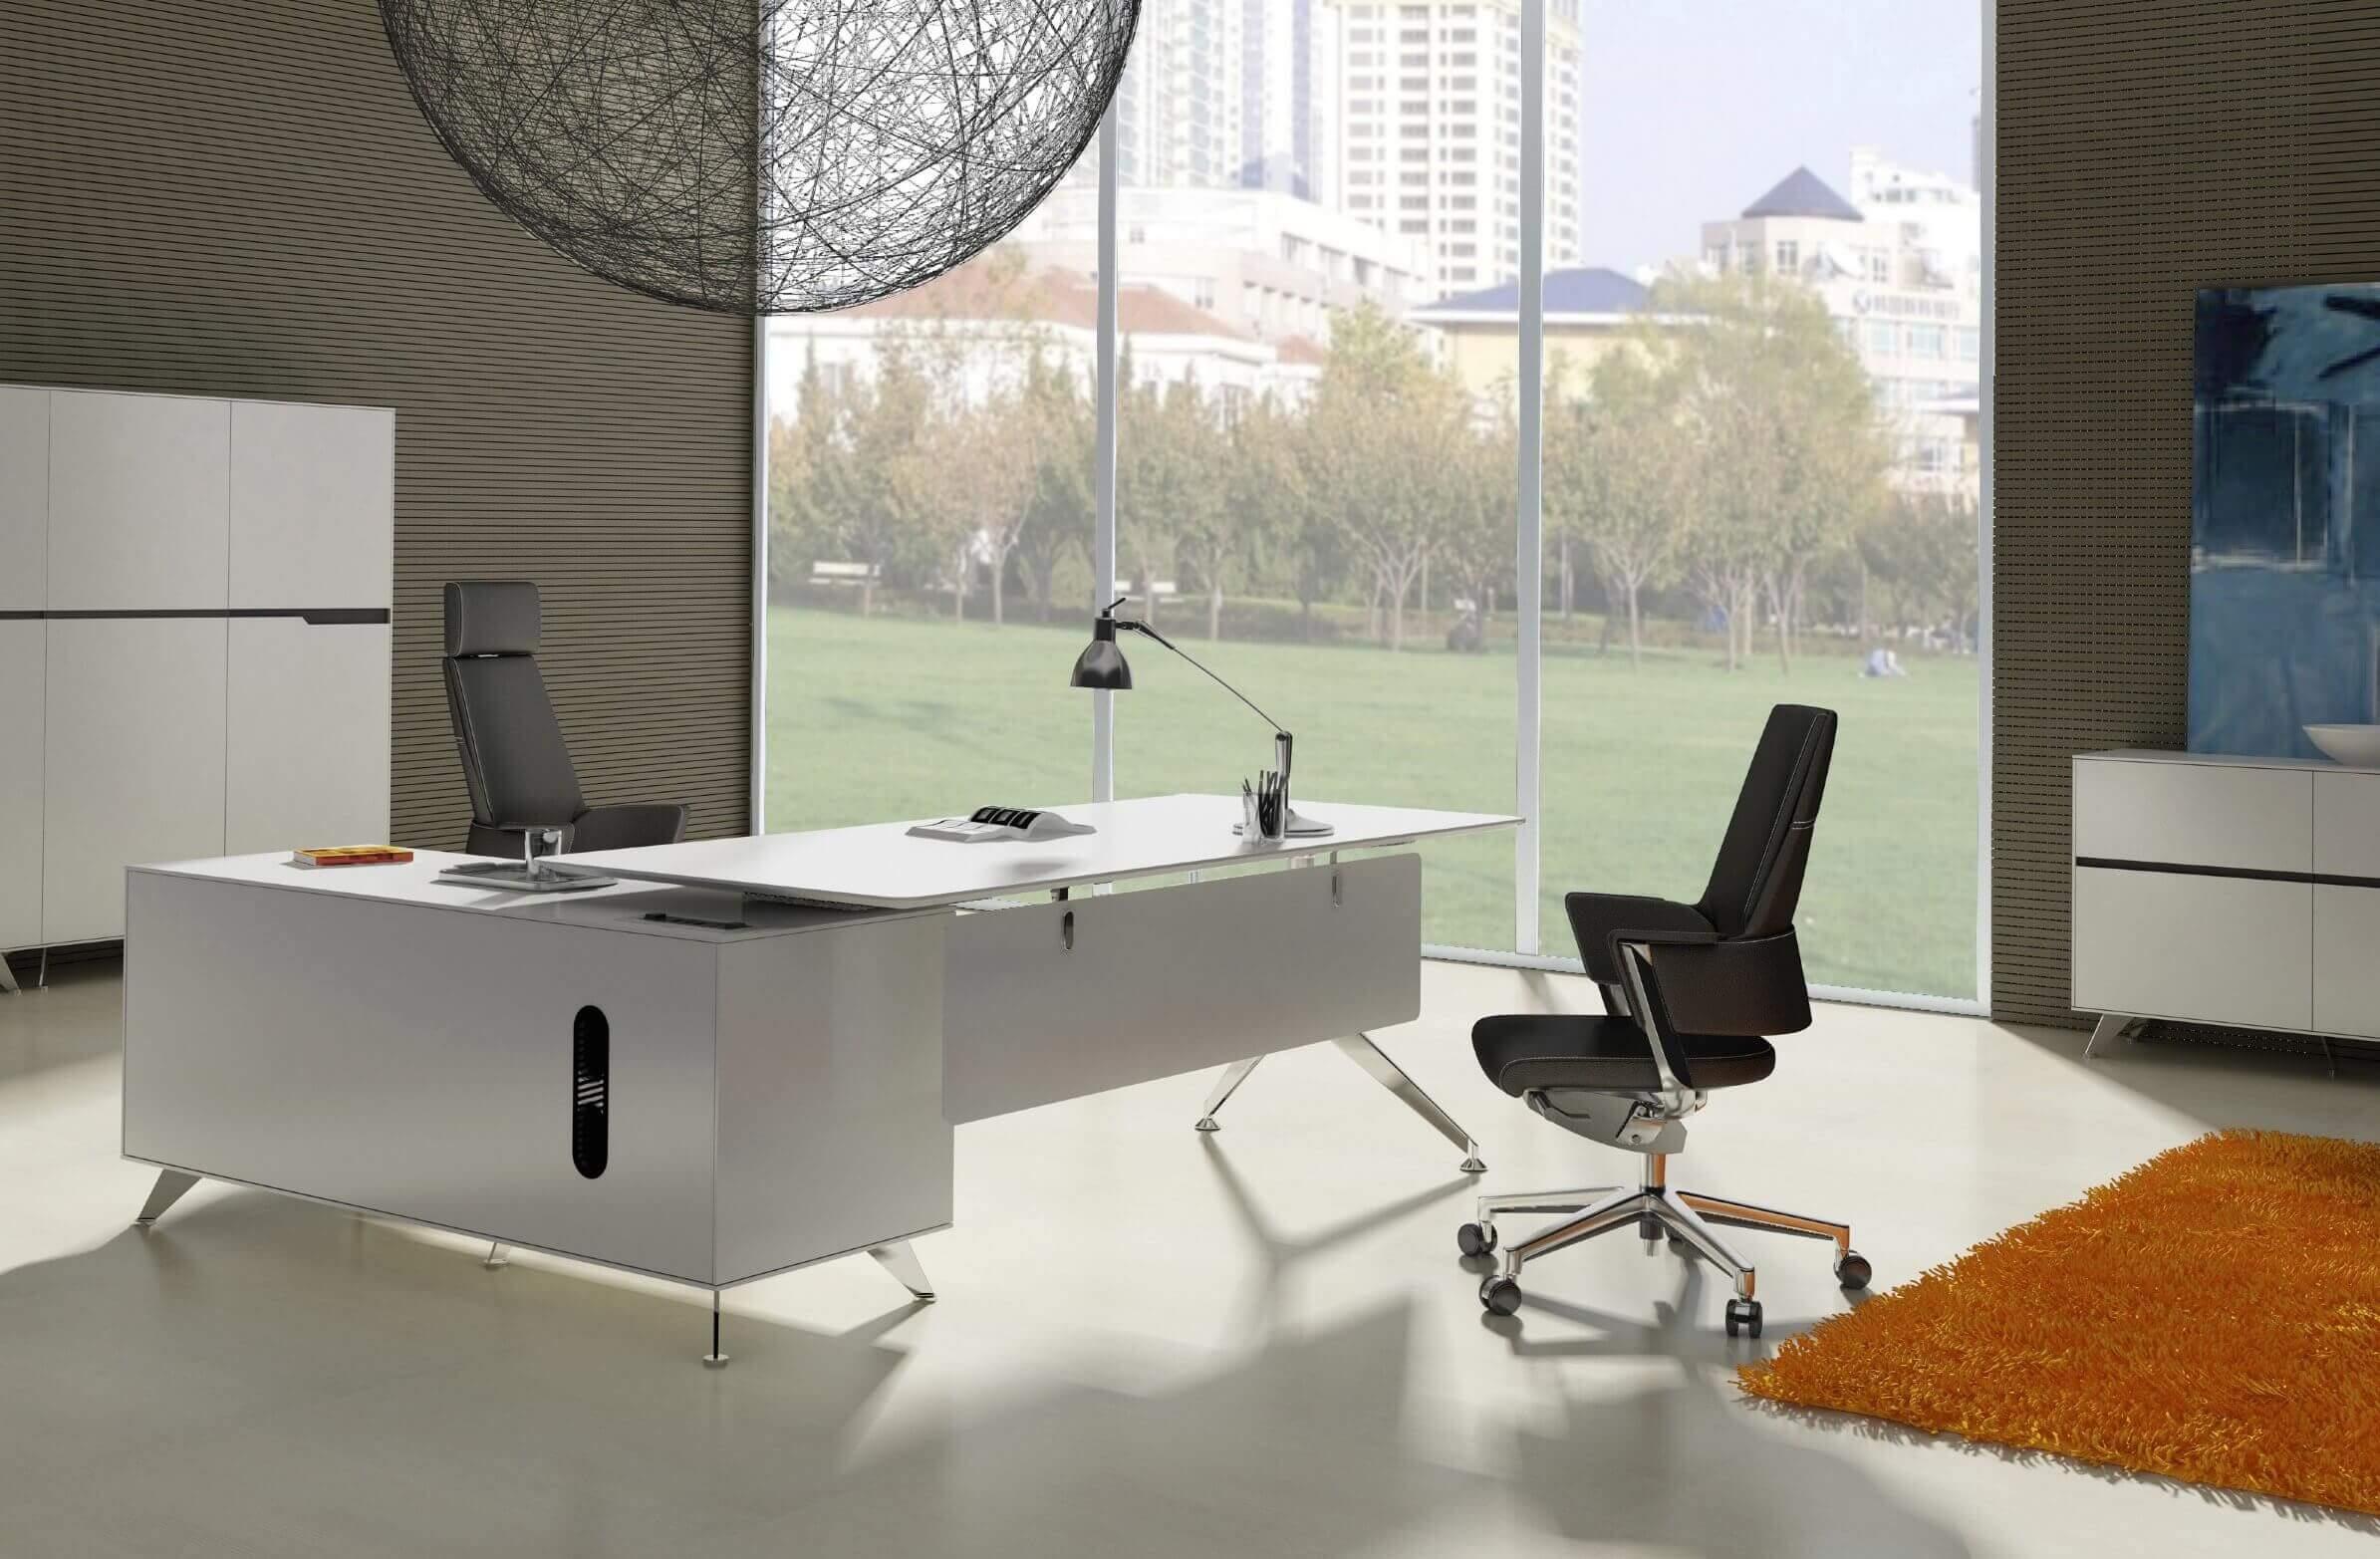 Tips for Choosing the Right Office Desk